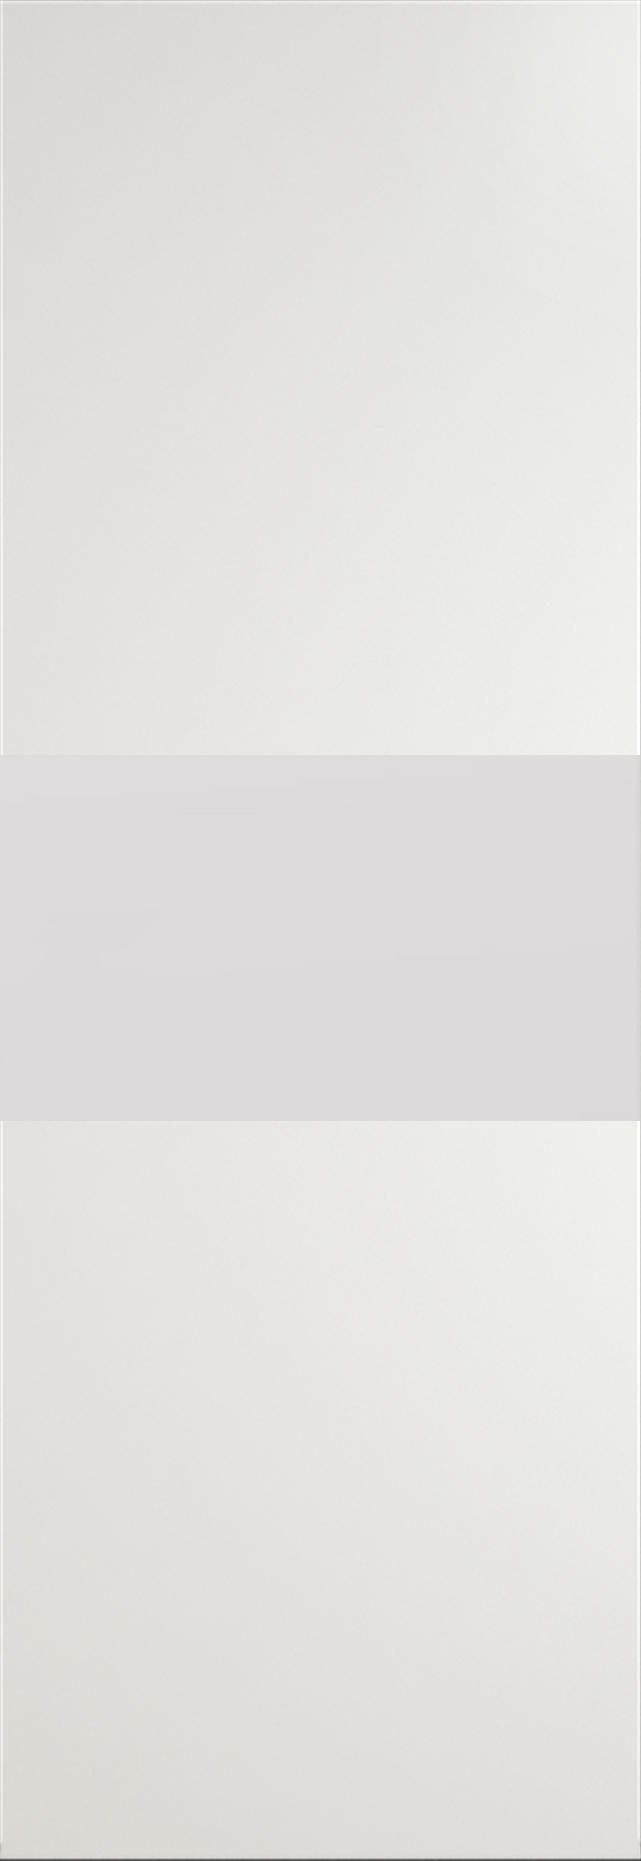 Tivoli Е-4 Invisible цвет - Бежевая эмаль Без стекла (ДГ)